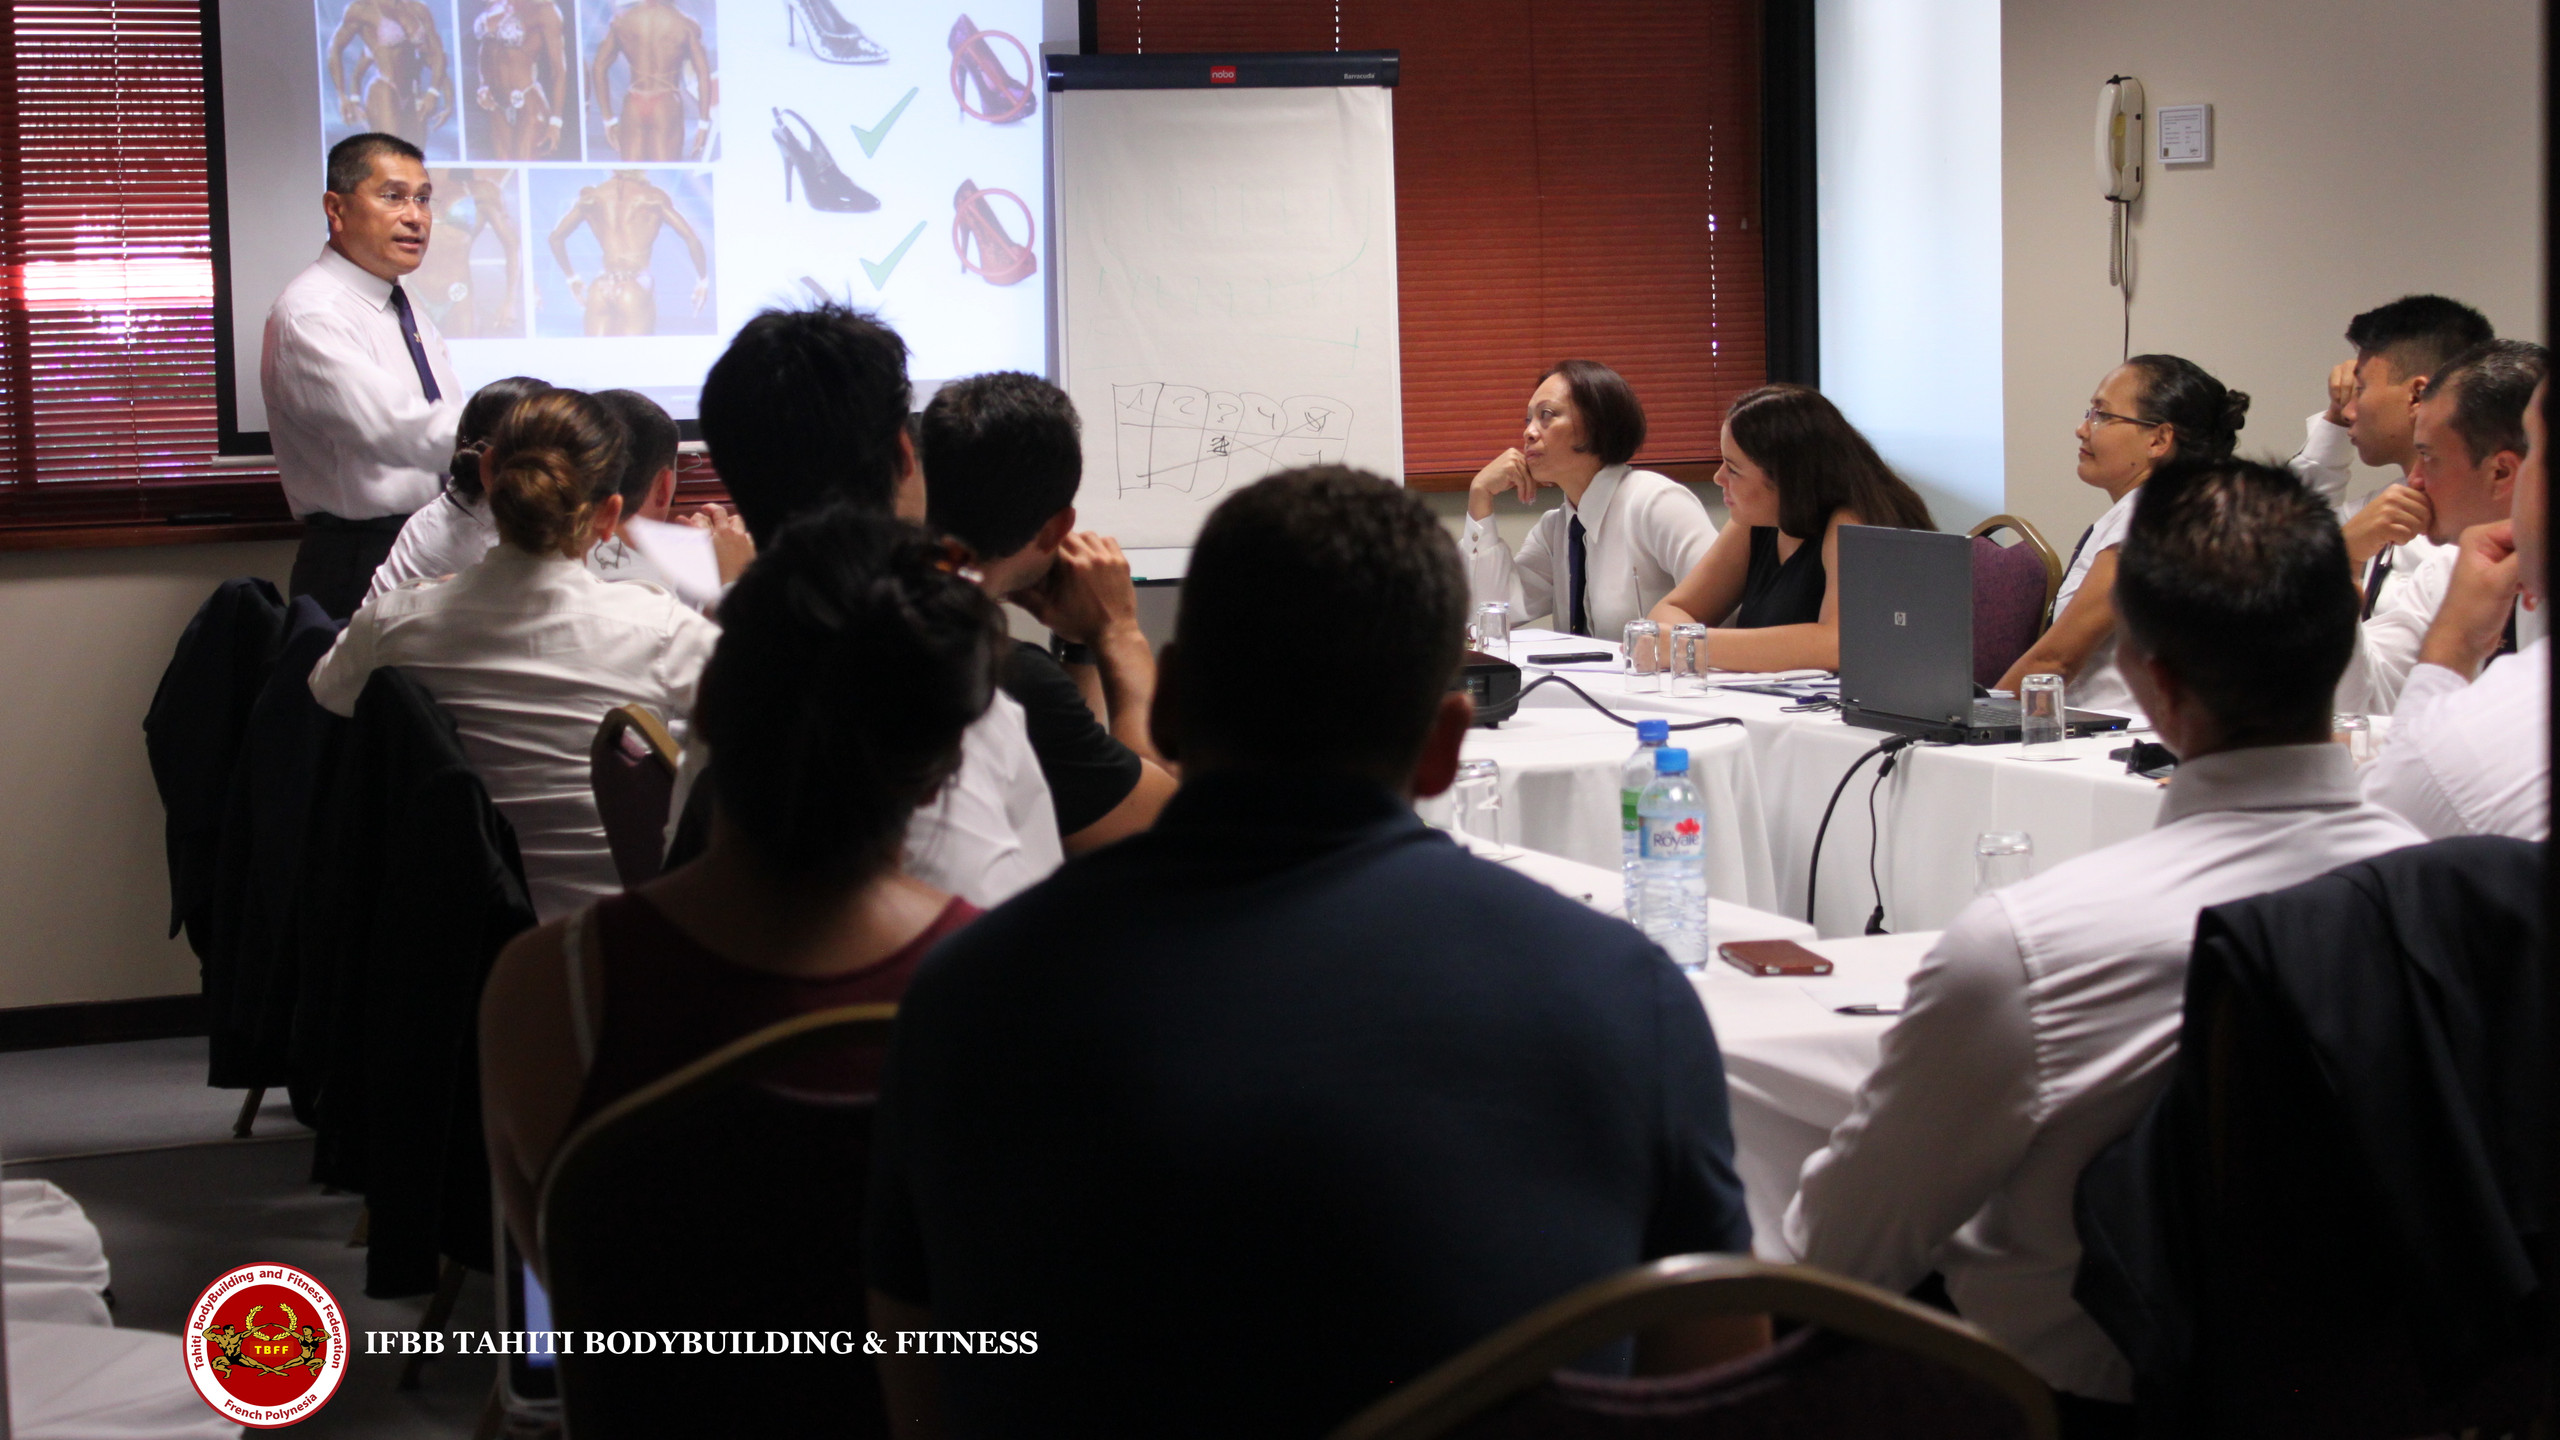 FORMATION JUGES & OFFICIELS IFBB TAHITI 2014